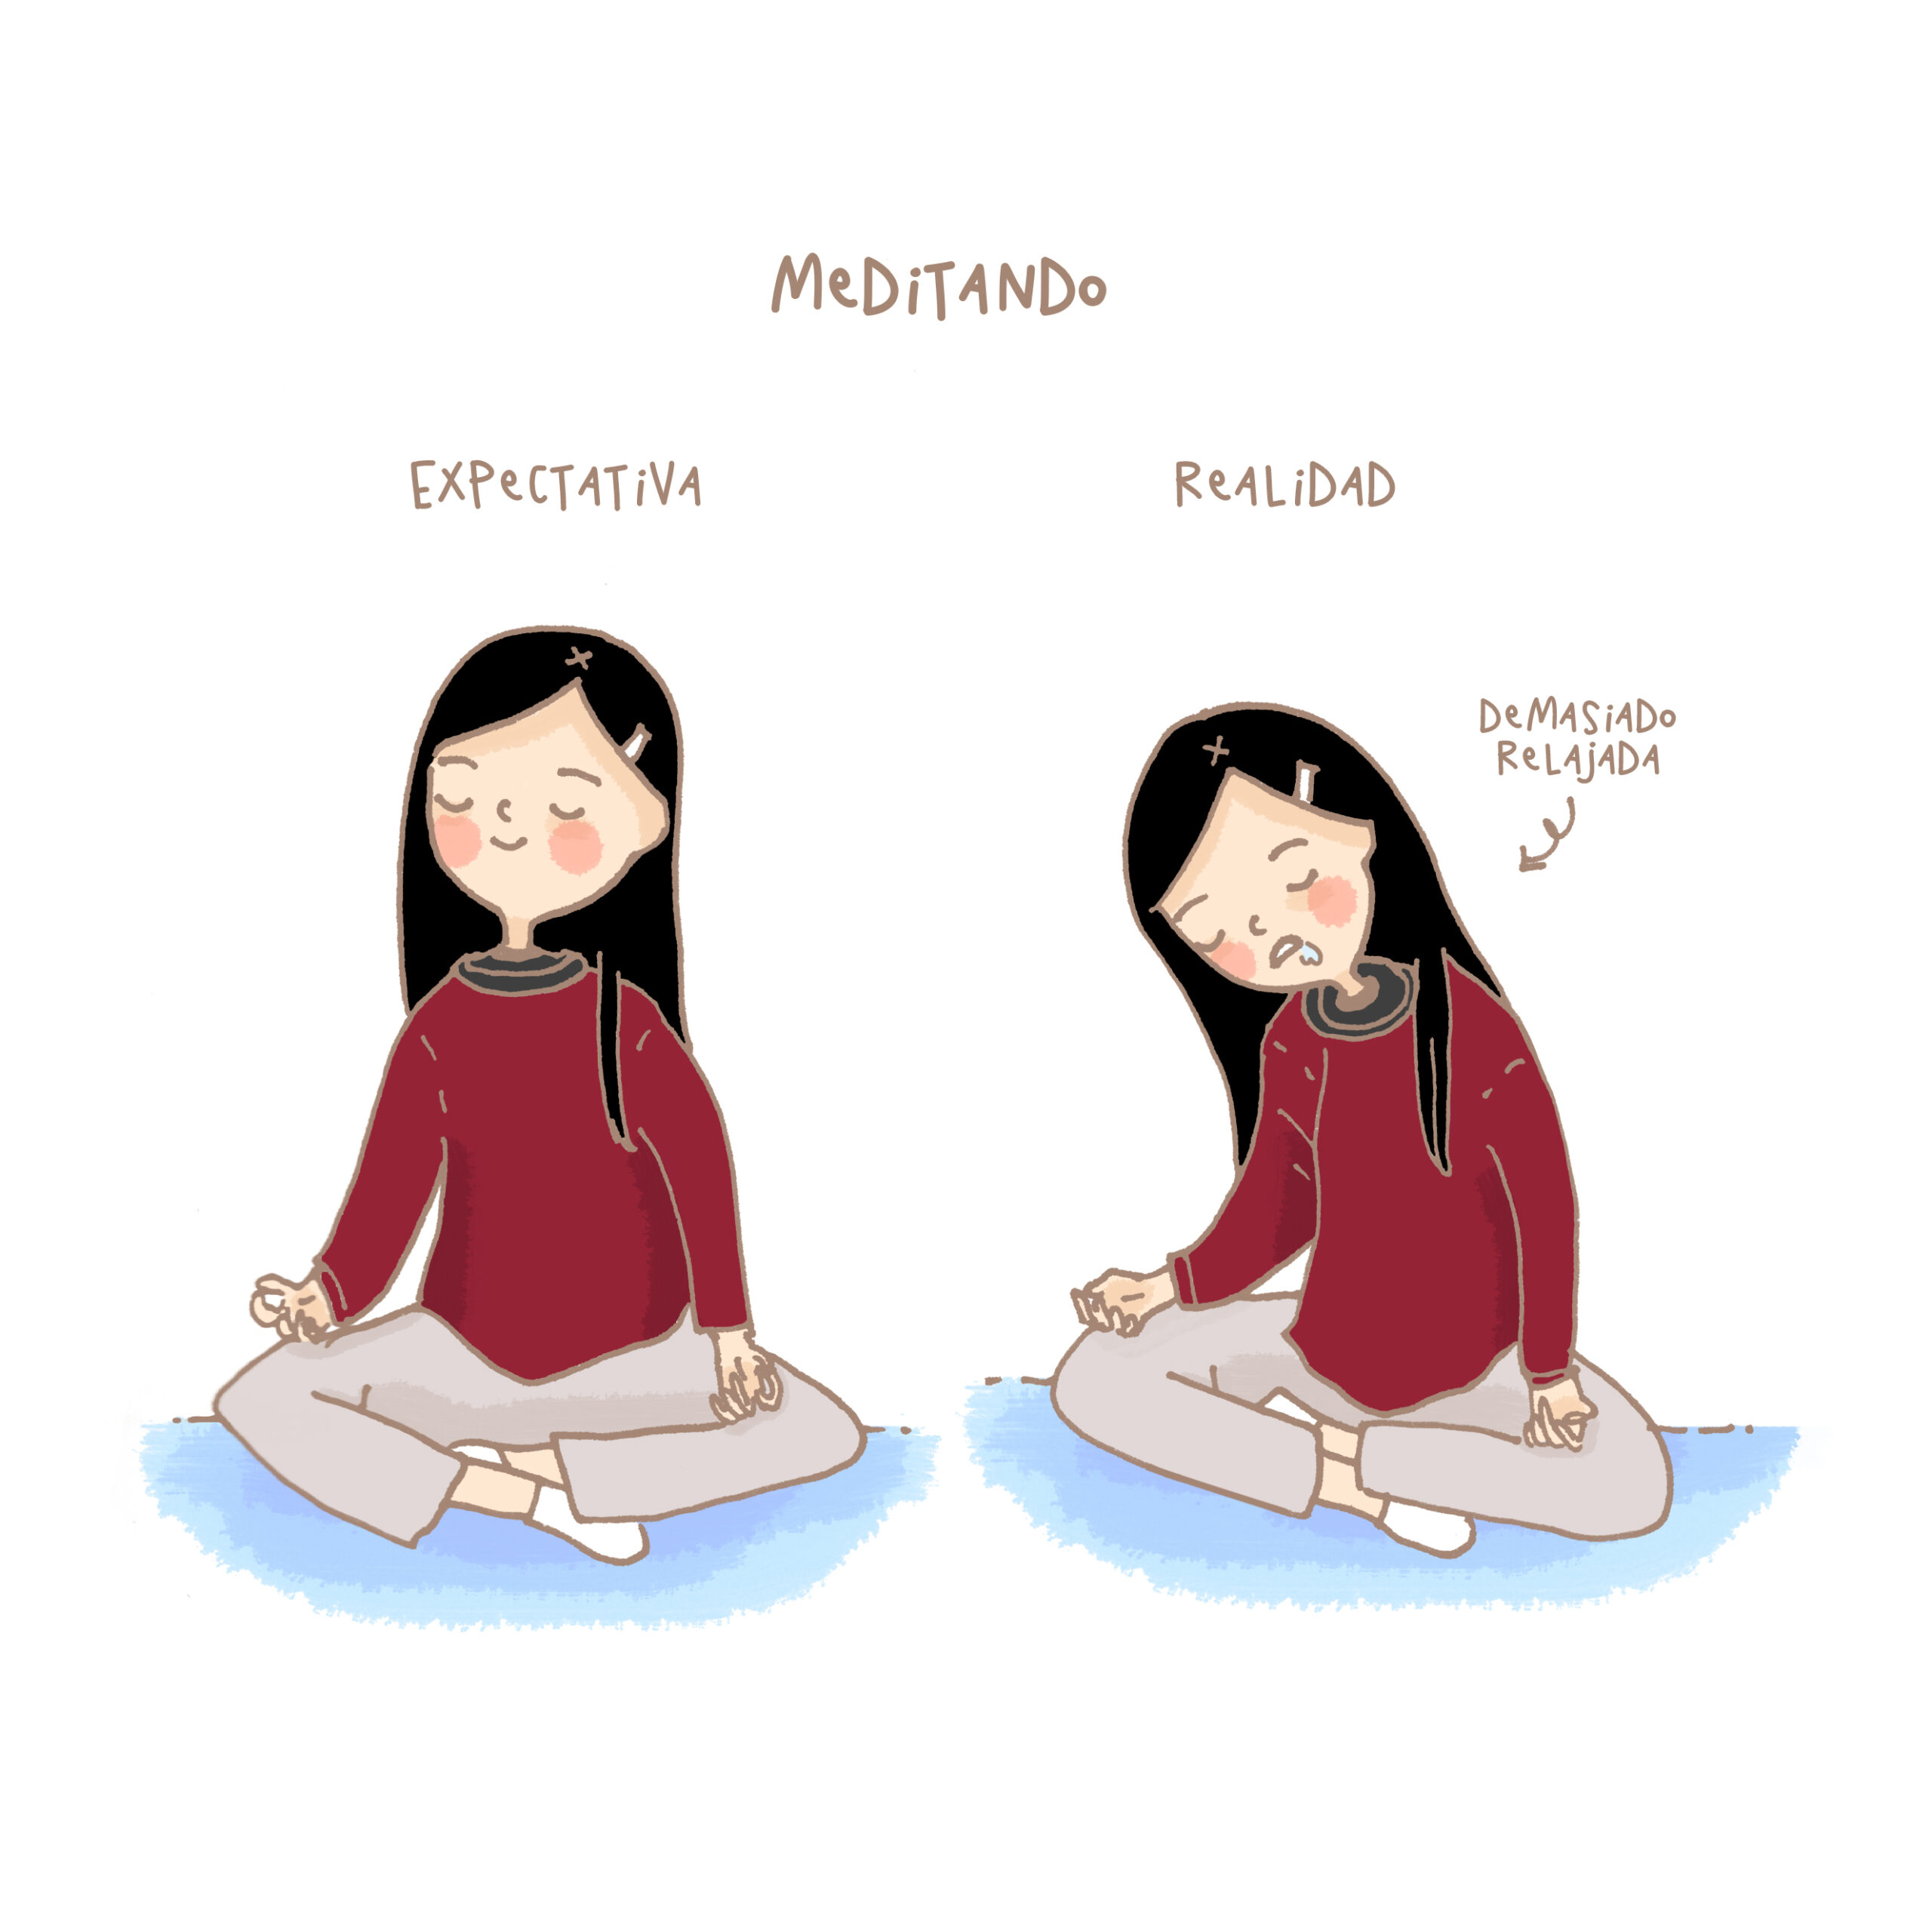 dibujo expectativa realidad sobre meditacion